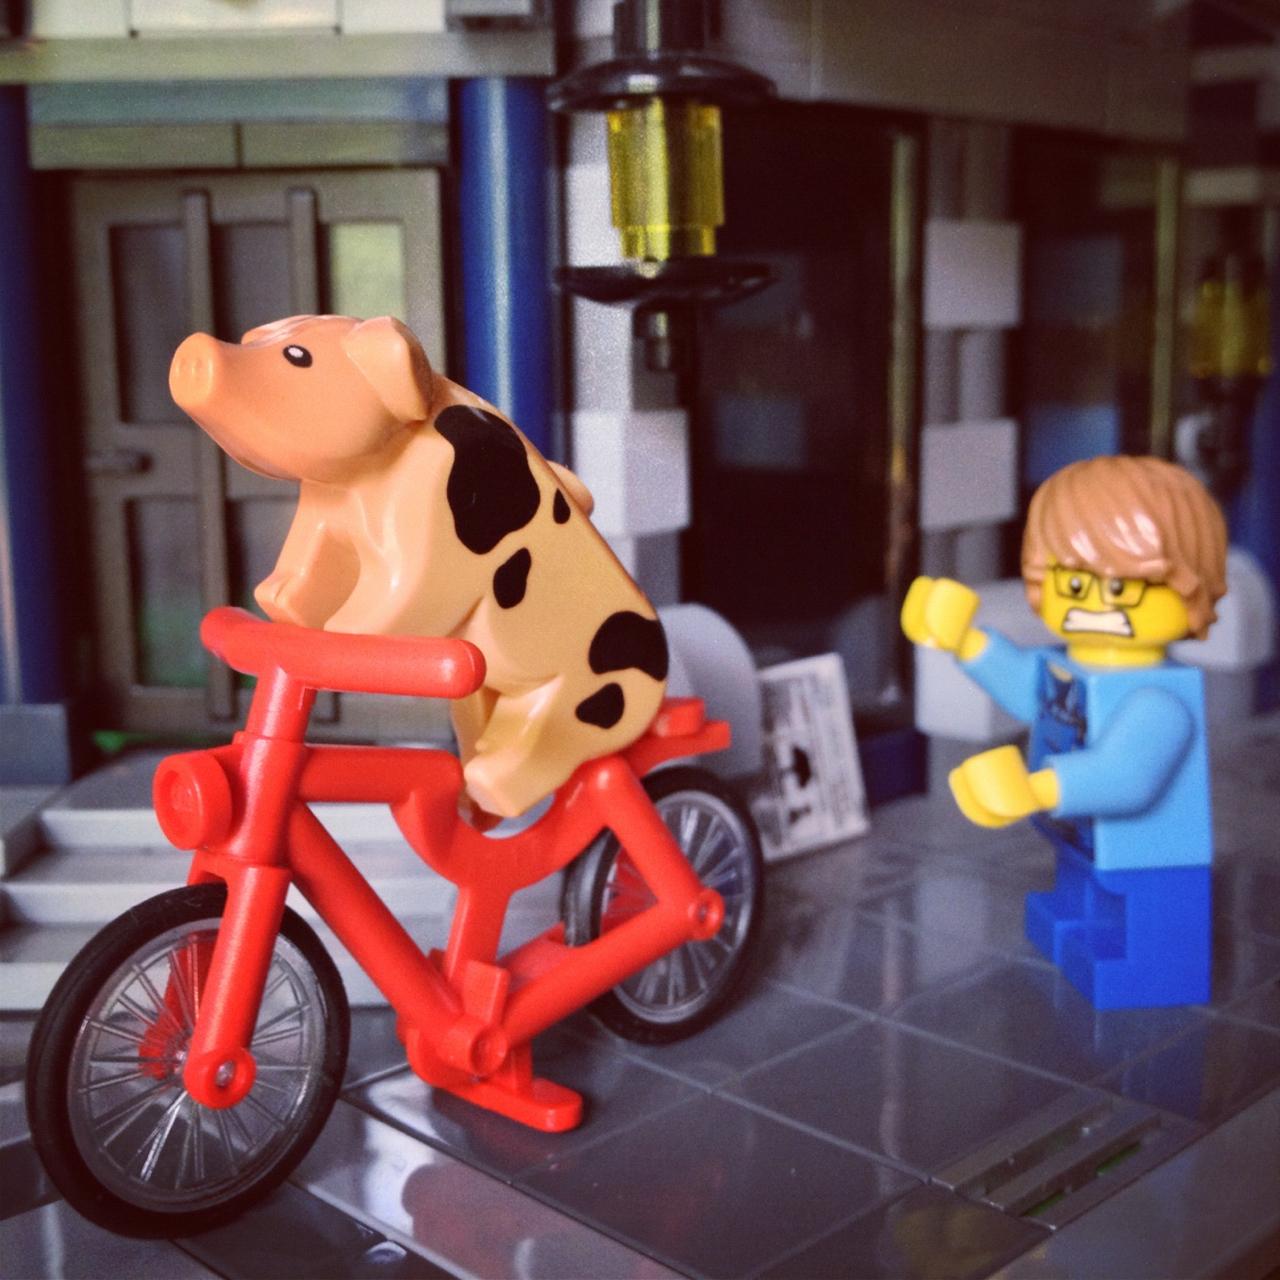 LegoGenre 00176: Some Pig